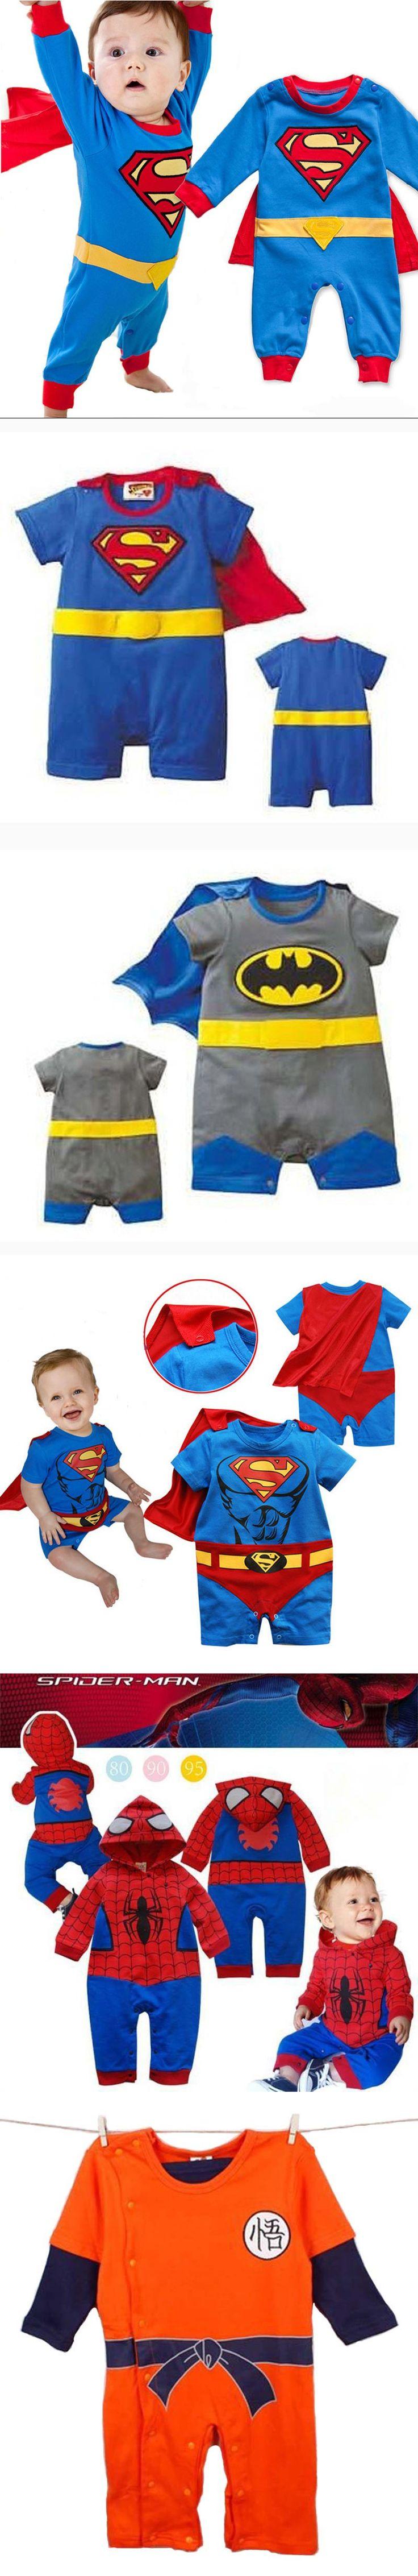 2016 Summer Newborn Baby Costume Baby Rompers Superhero Superman Cotton Baby Boy Girl Rompers Newborn Baby Clothes